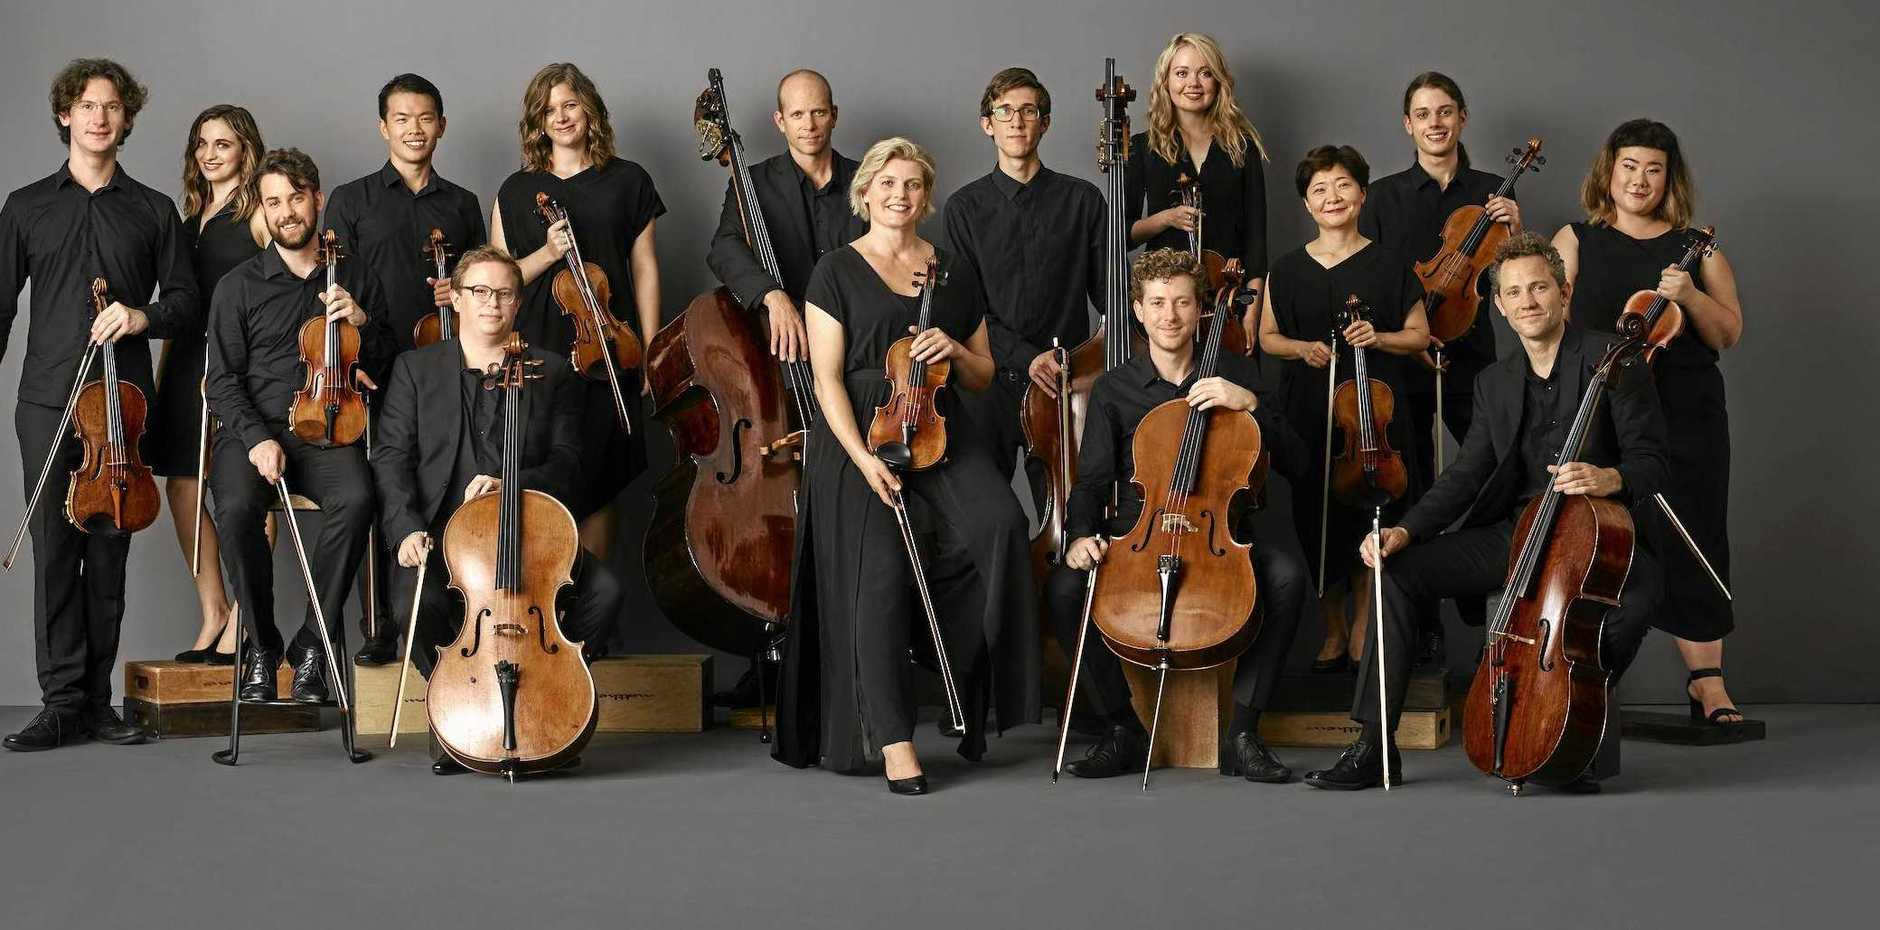 SERENADE FOR STRINGS: Australian Chamber Orchestra Collective featuring ACO Principal Violin Helena Rathbone.